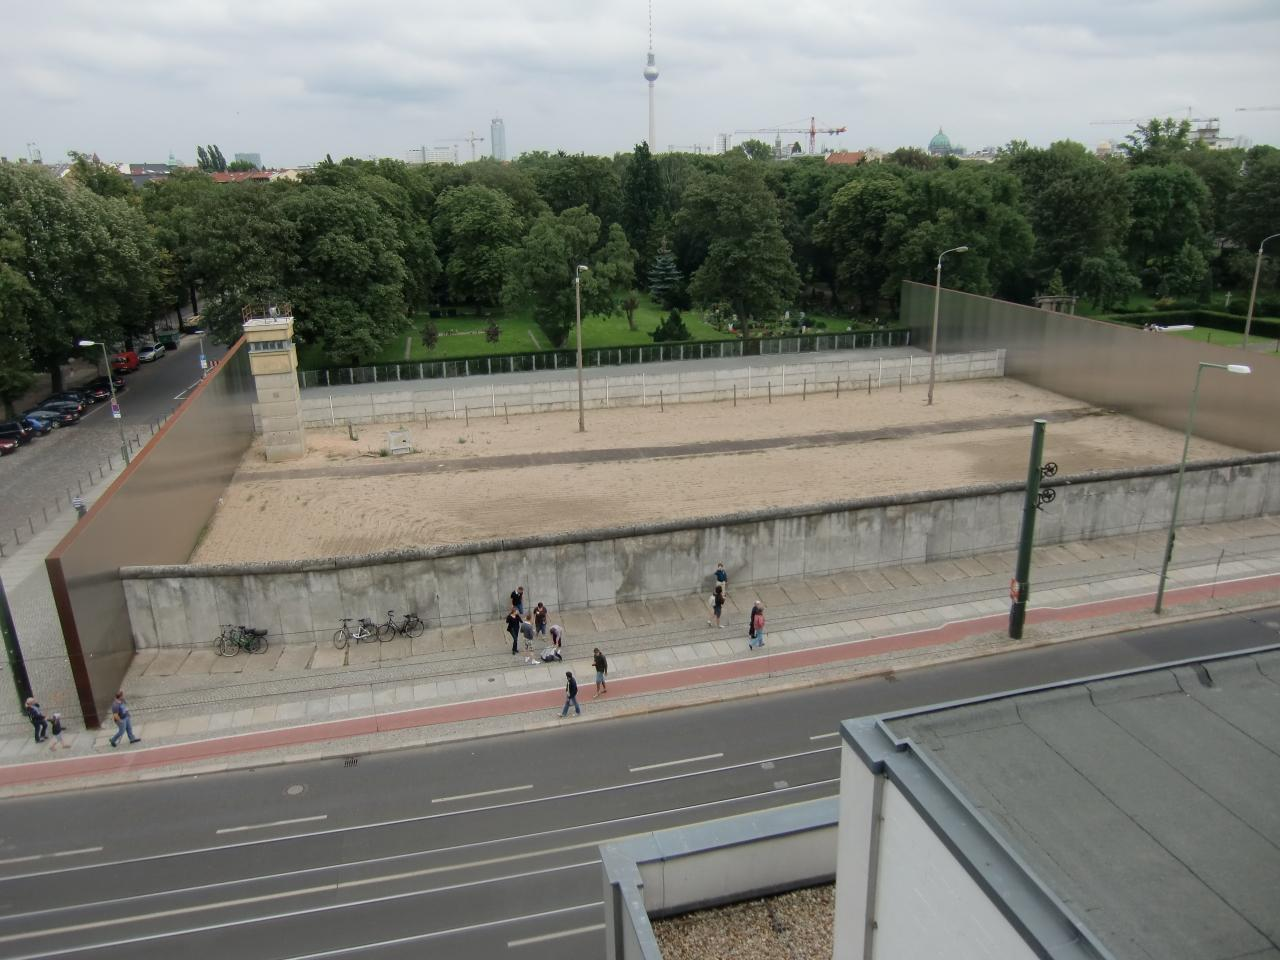 13august1961 ベルリンの壁が伝えることベルリンドイツの